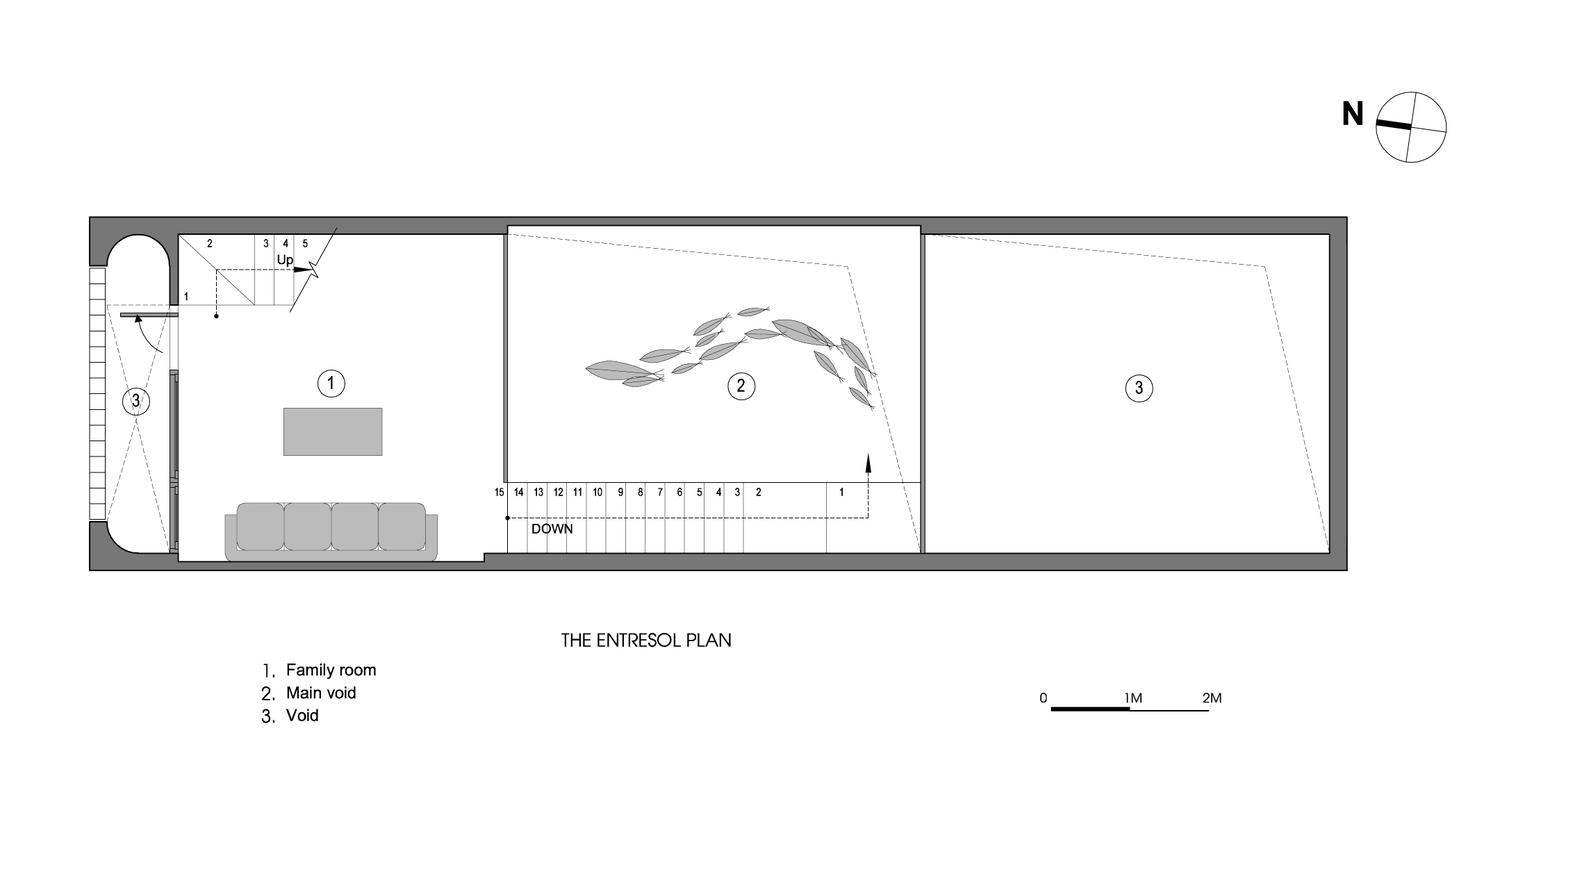 02. The entresol plan